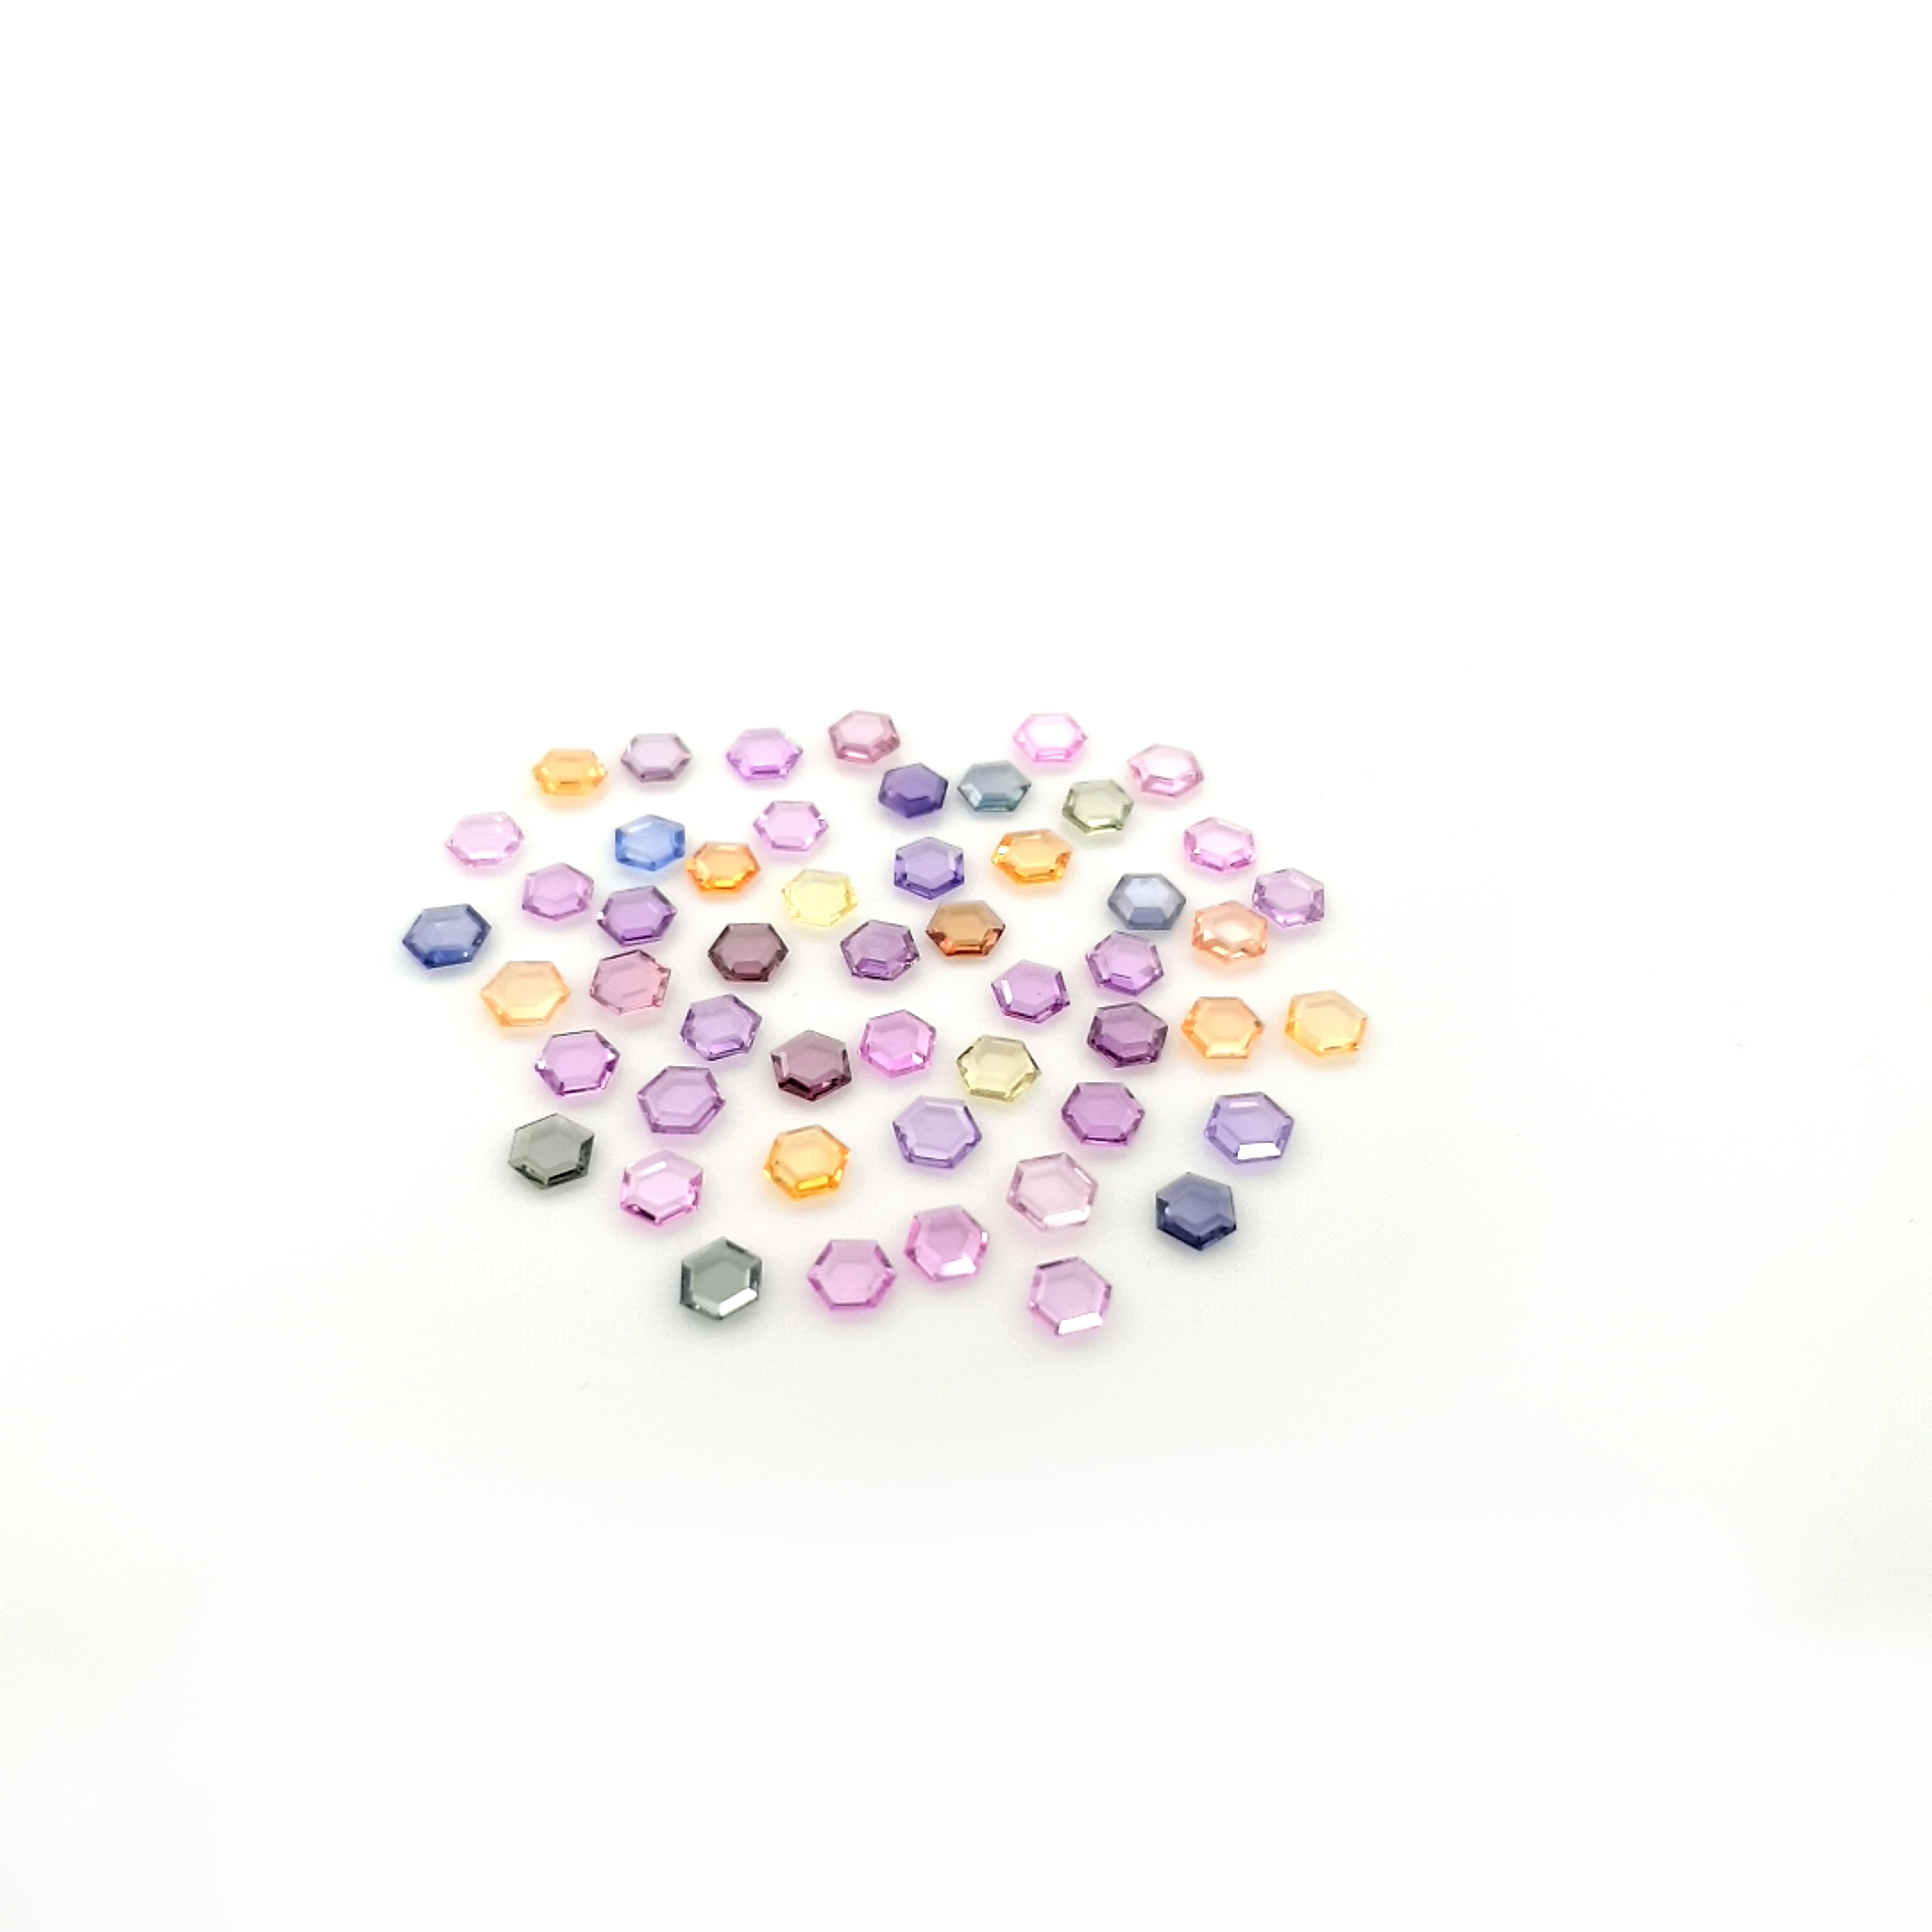 FancySapphire-4mm-hexagone-SFB20C7-ClaudiaHamannEdelstein__2021-02-01-16-45-41